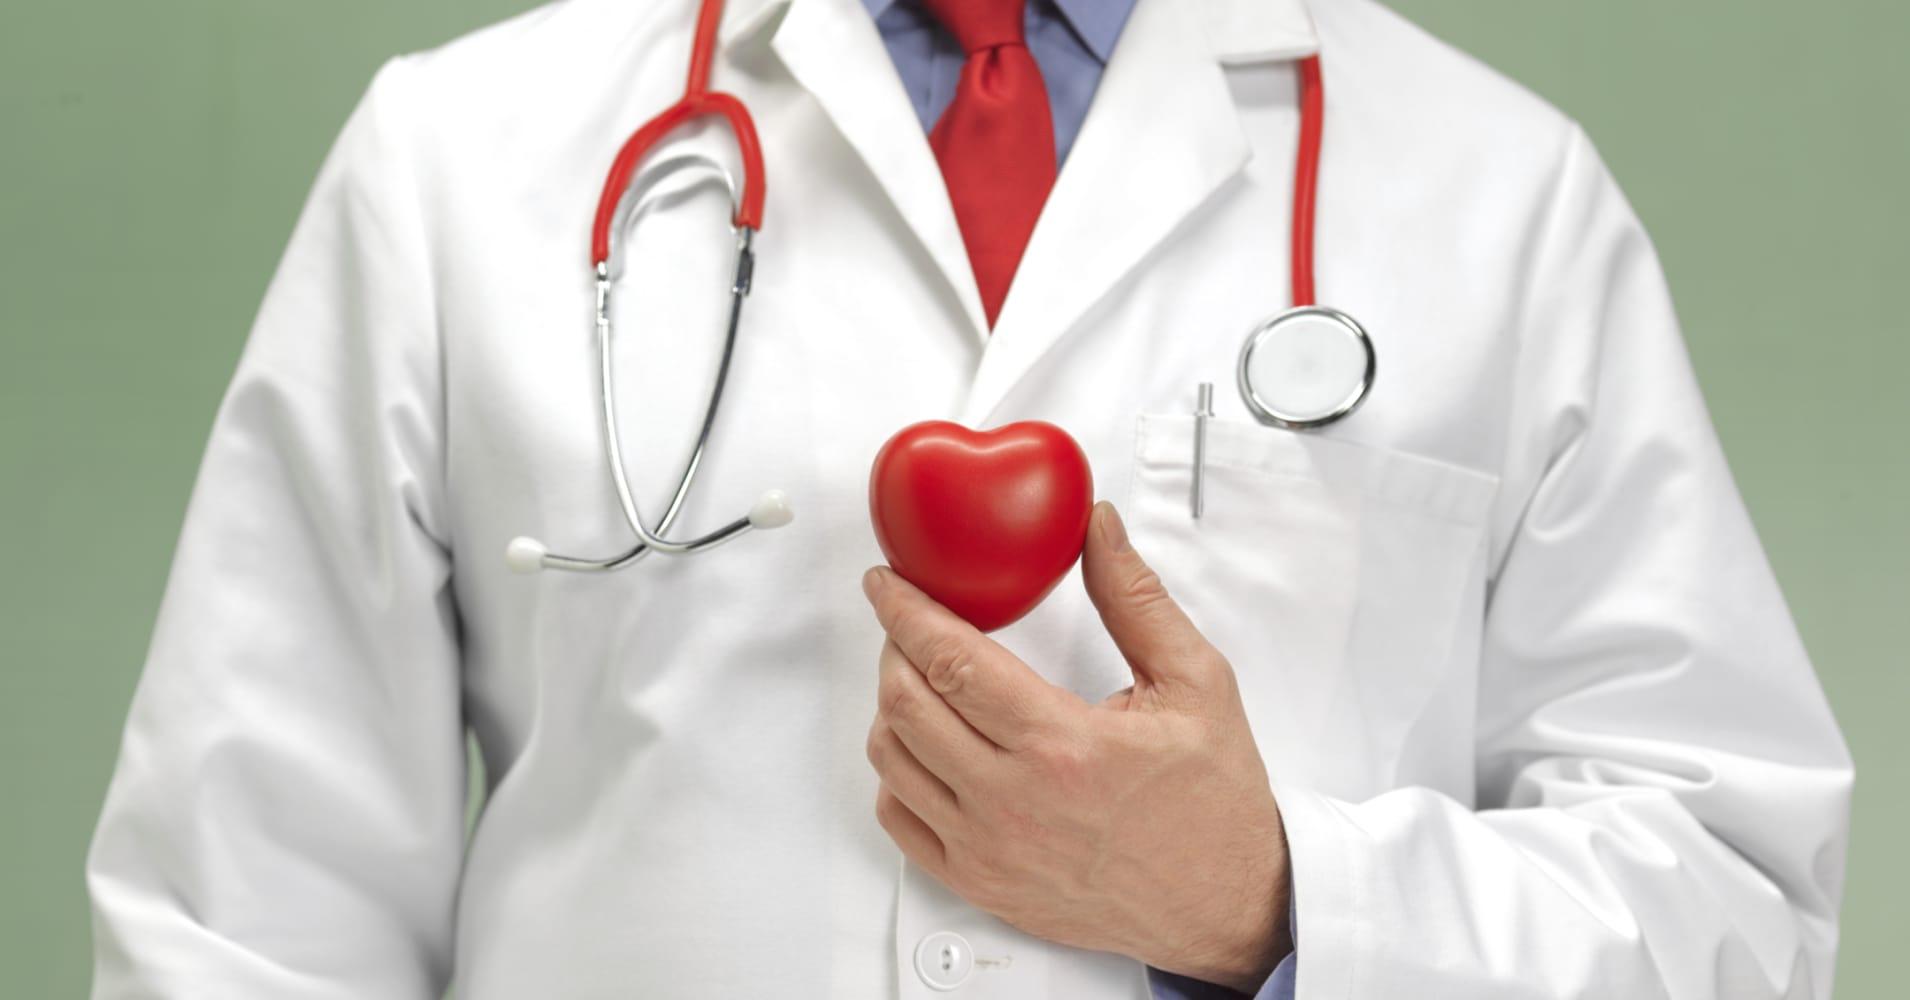 New breakthrough treatments for heart failure offer hope for millions